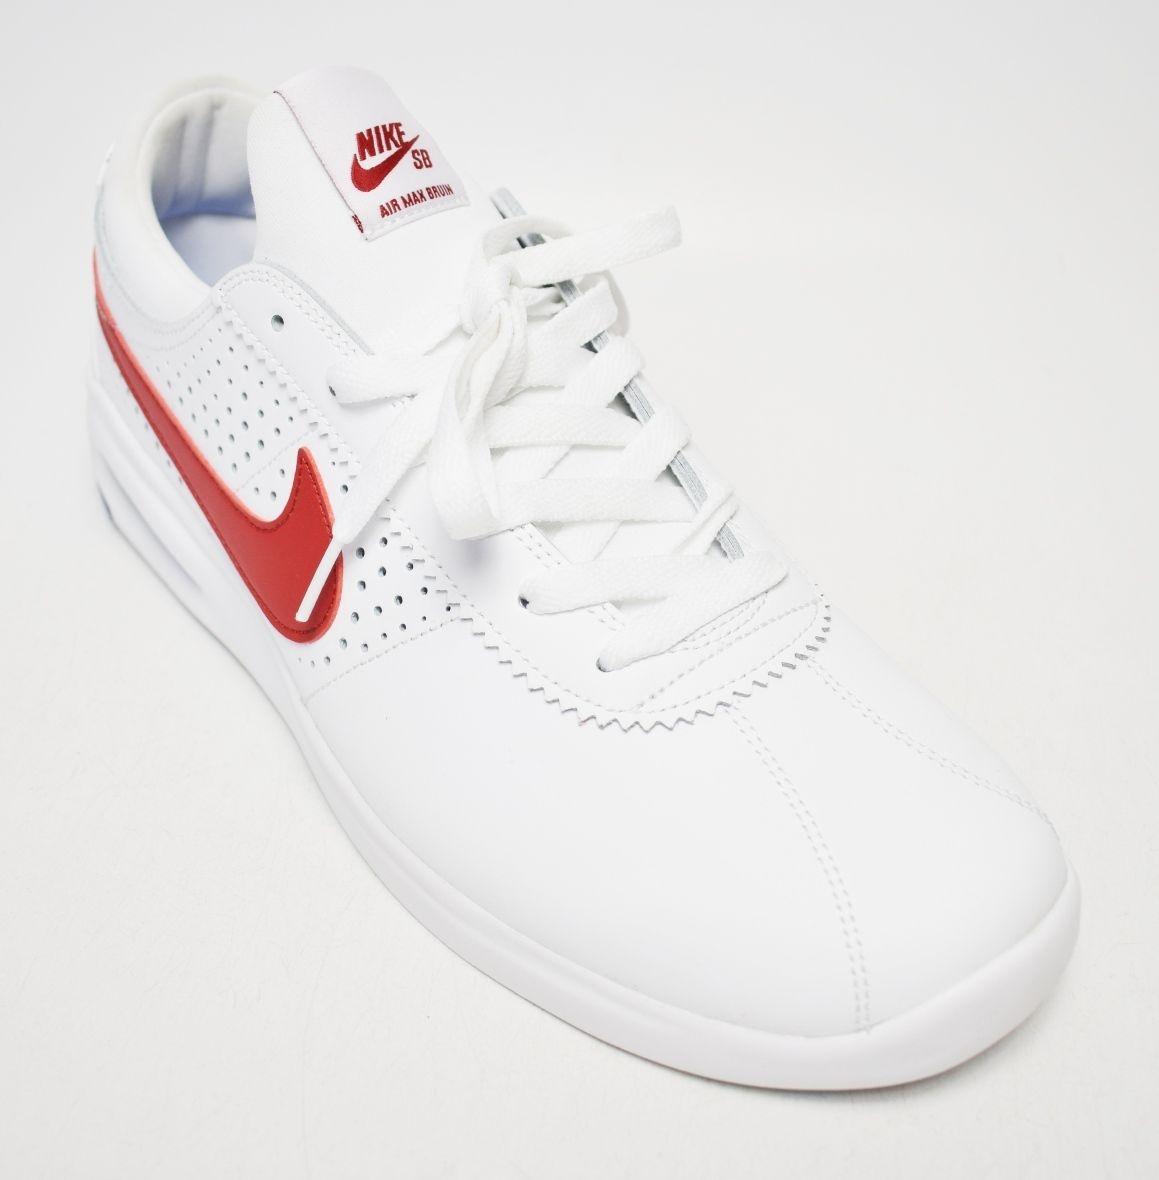 buy popular 6b92f 26ae8 Nike SB AIR MAX BRUIN VAPOR BUTY SPORTOWE 46 (7571687982)